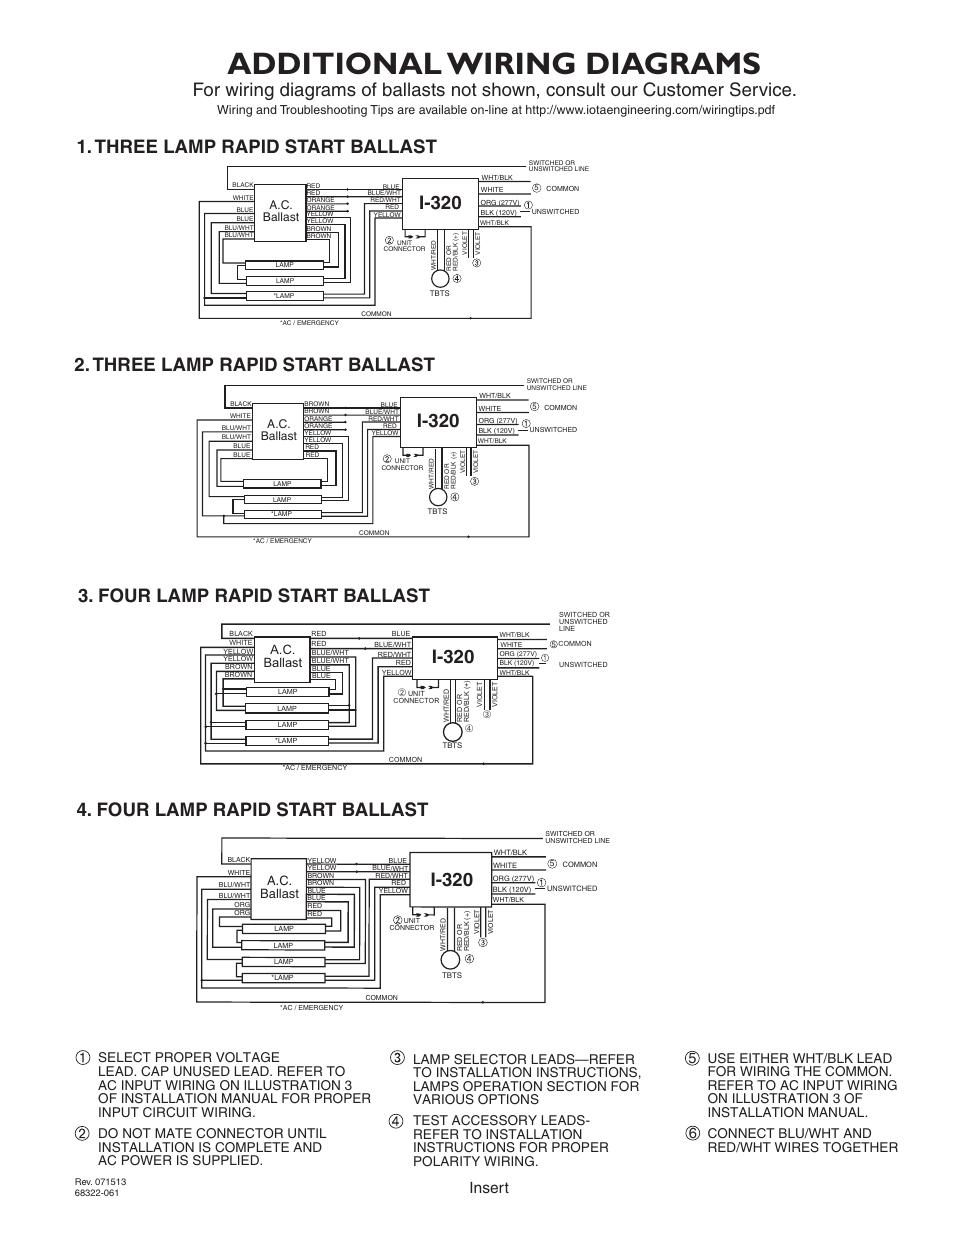 iota i320 emergency ballast wiring diagram energy transformation types library additional diagrams i 320 three lamp rapid start